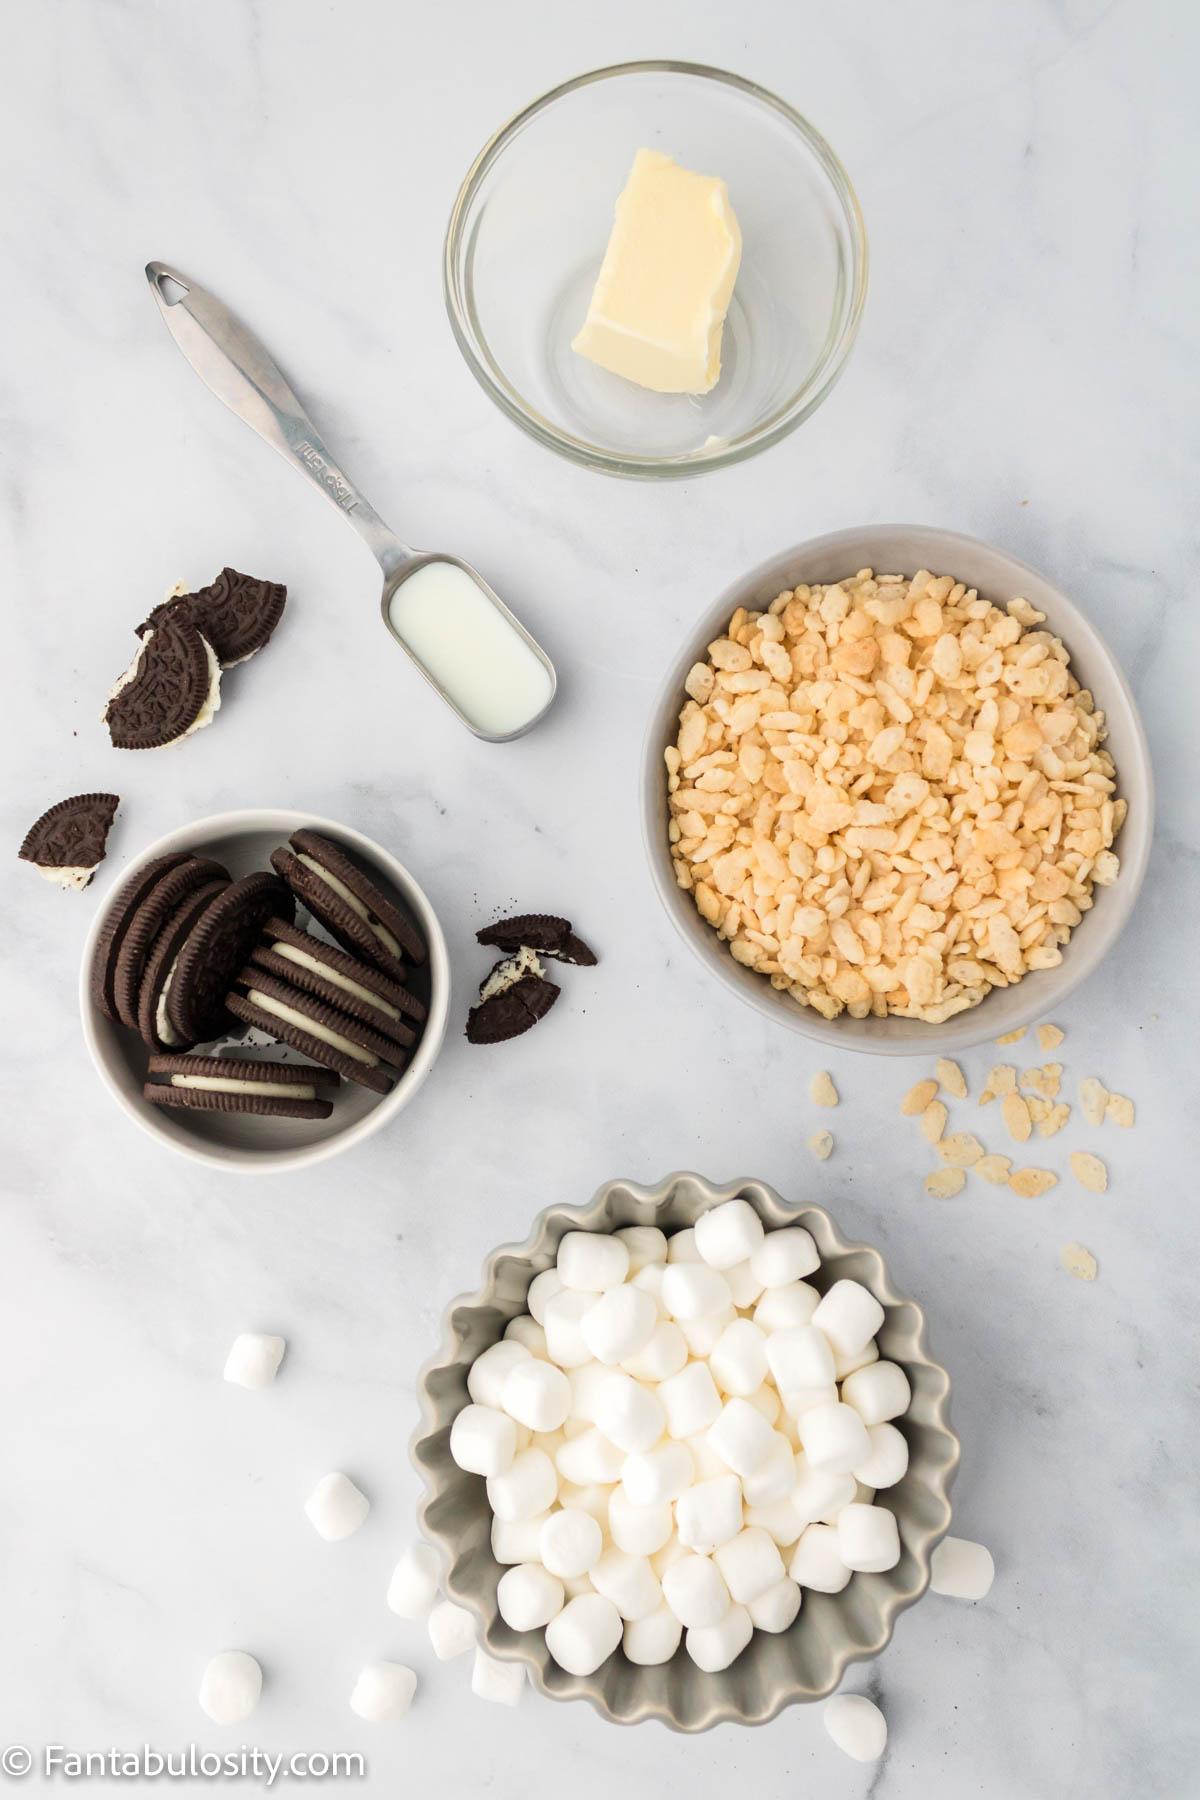 ingredients for cookies and cream rice krispies